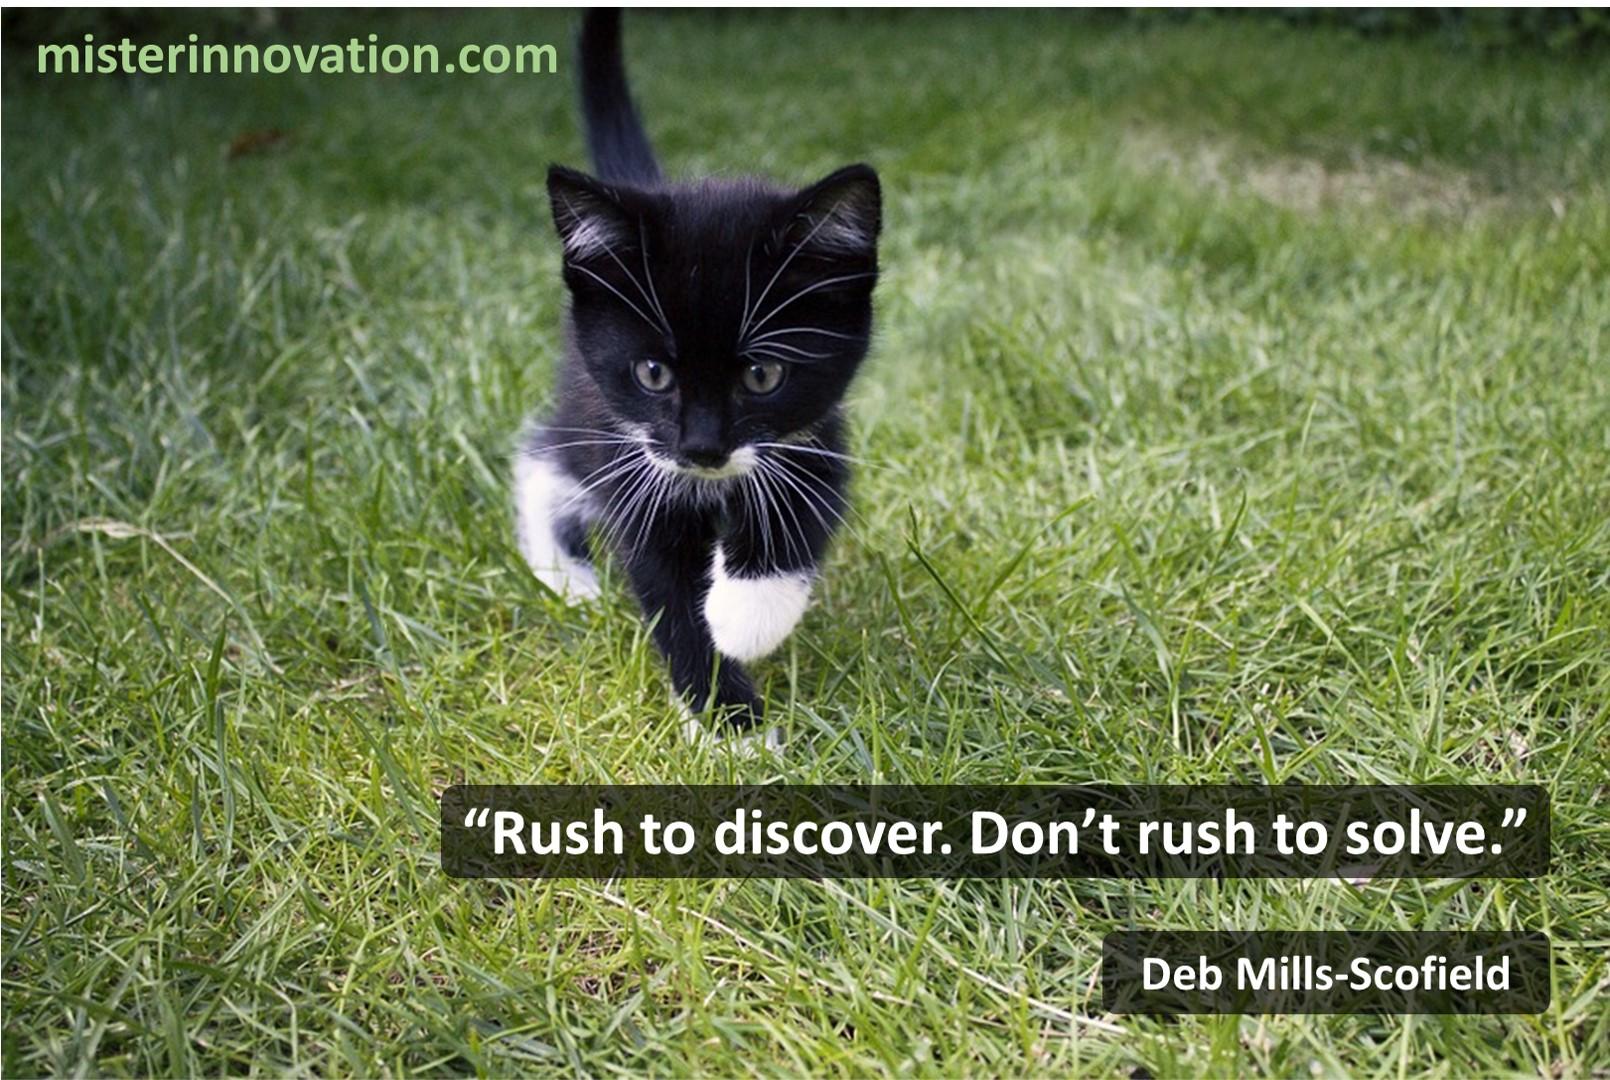 Deb Mills-Scofield Discover